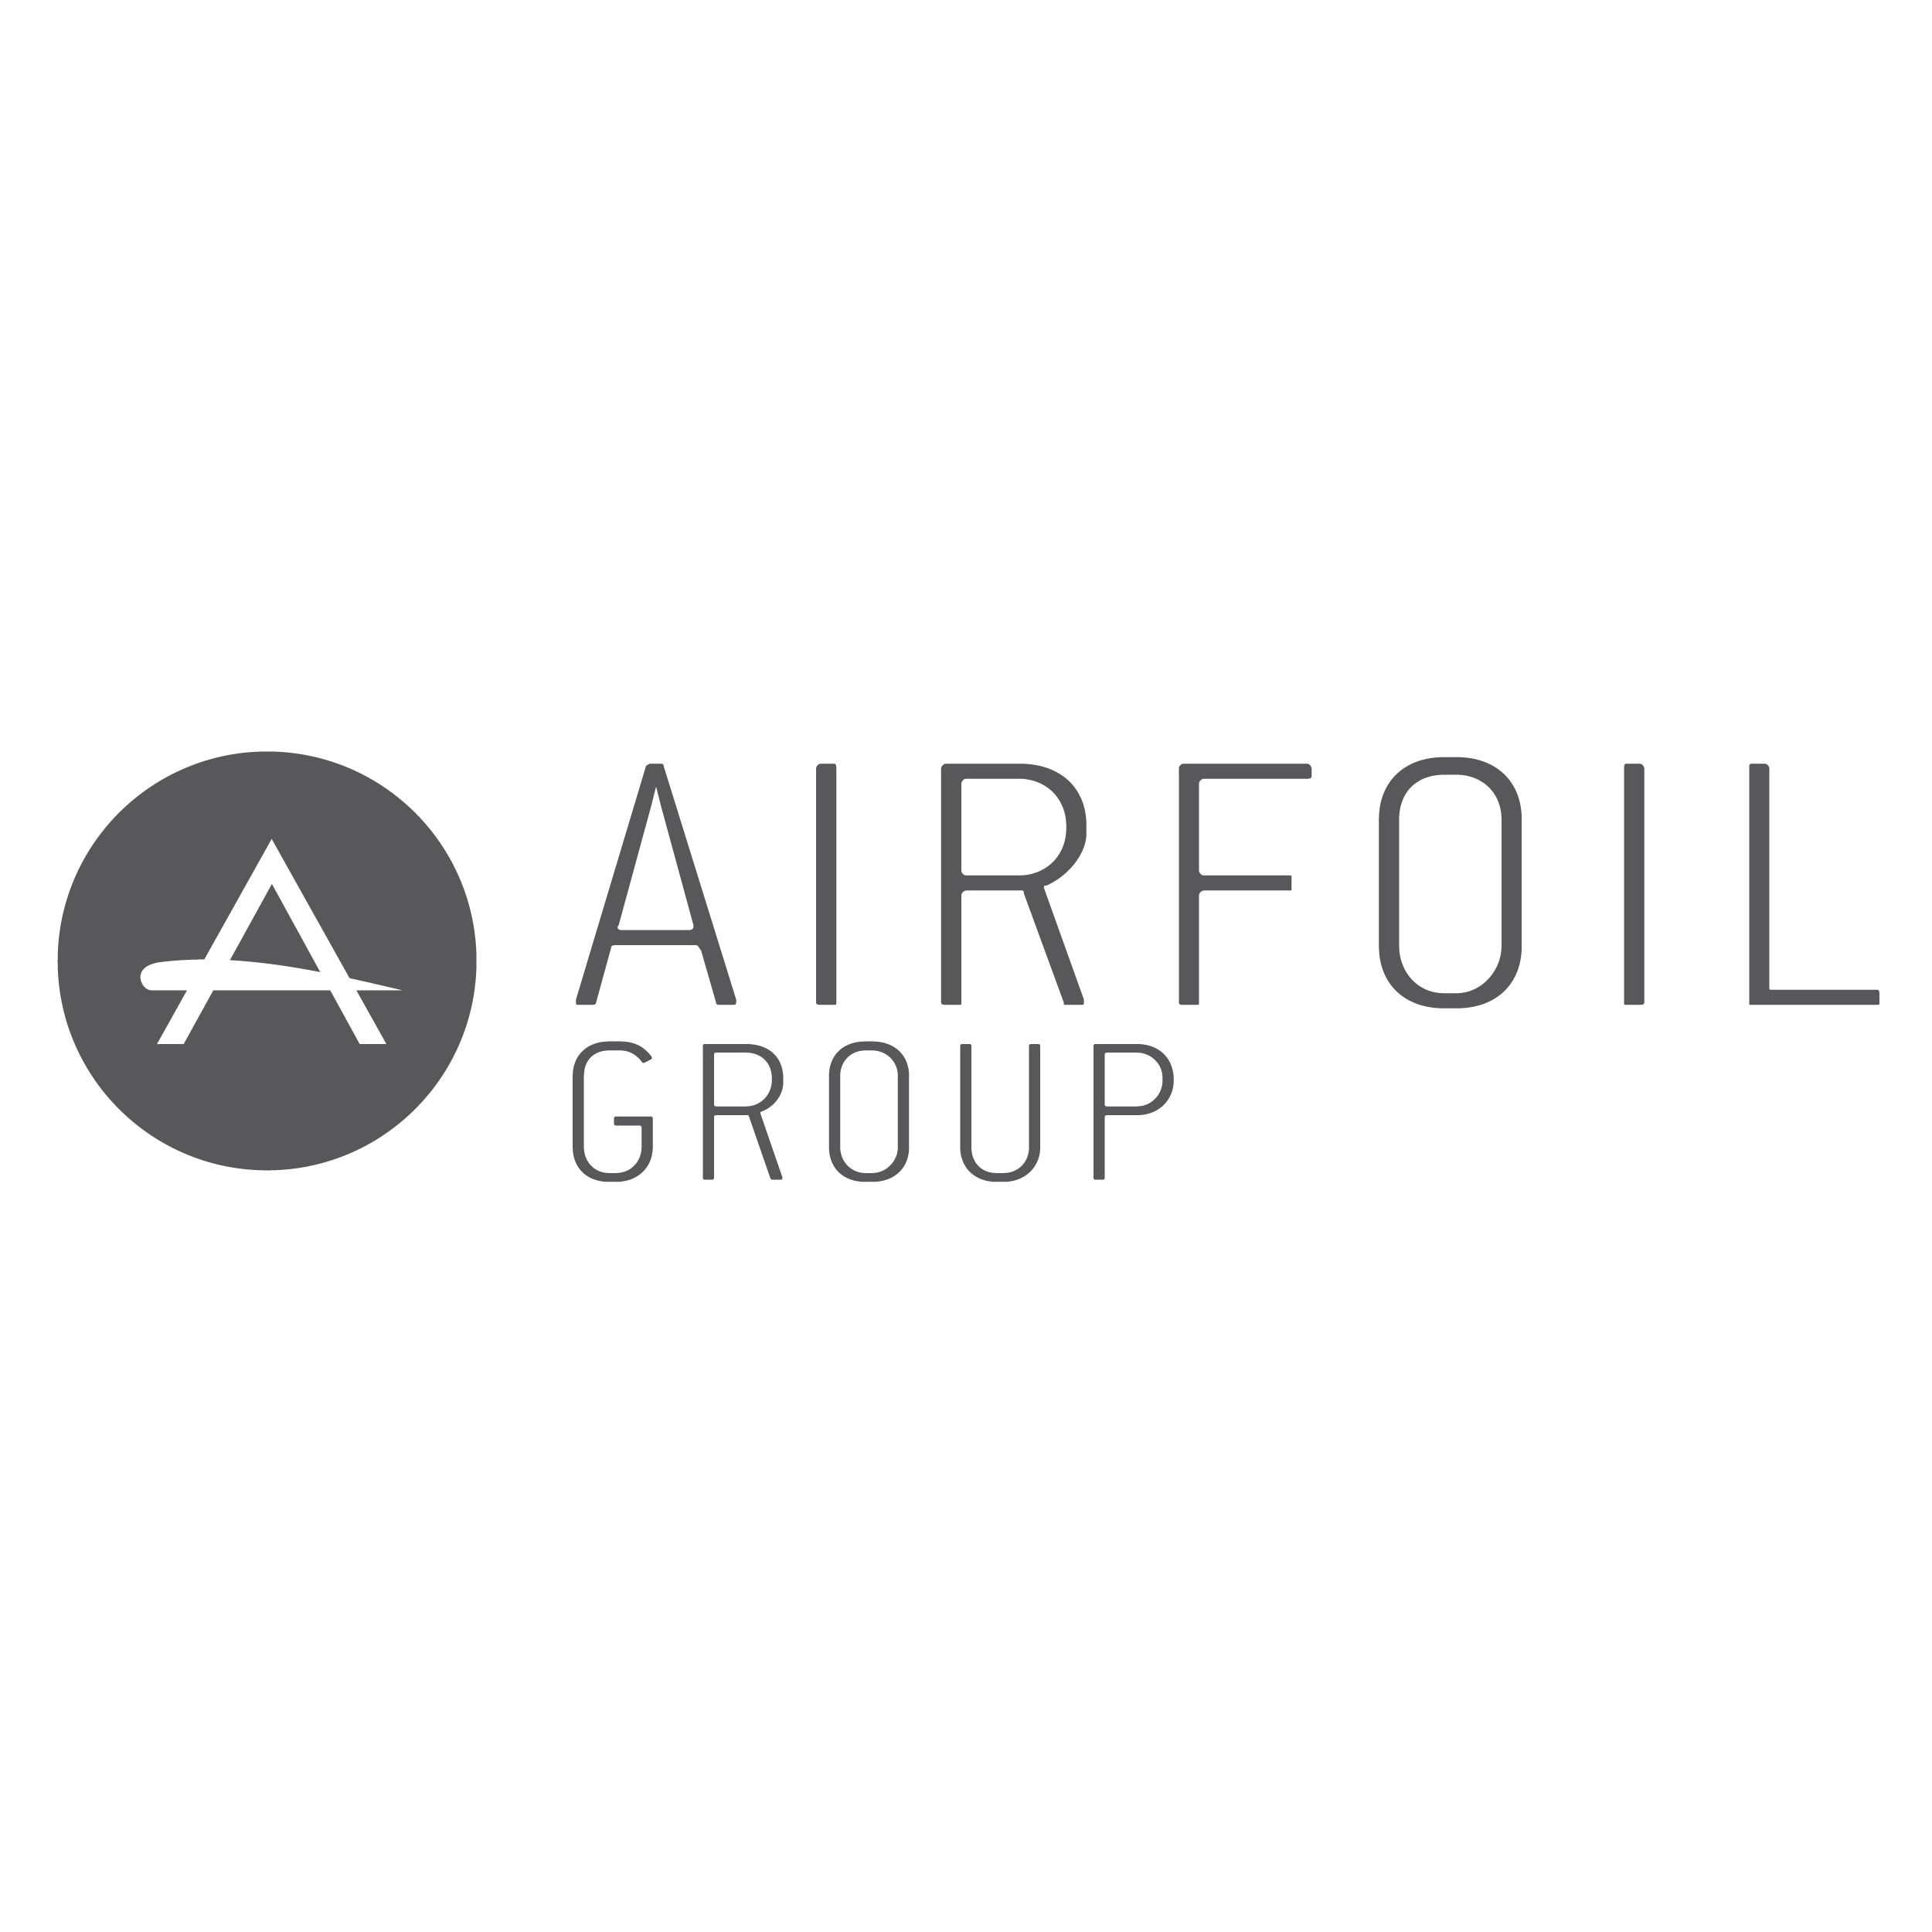 Airfoil_Group_BW_Horizontal-01